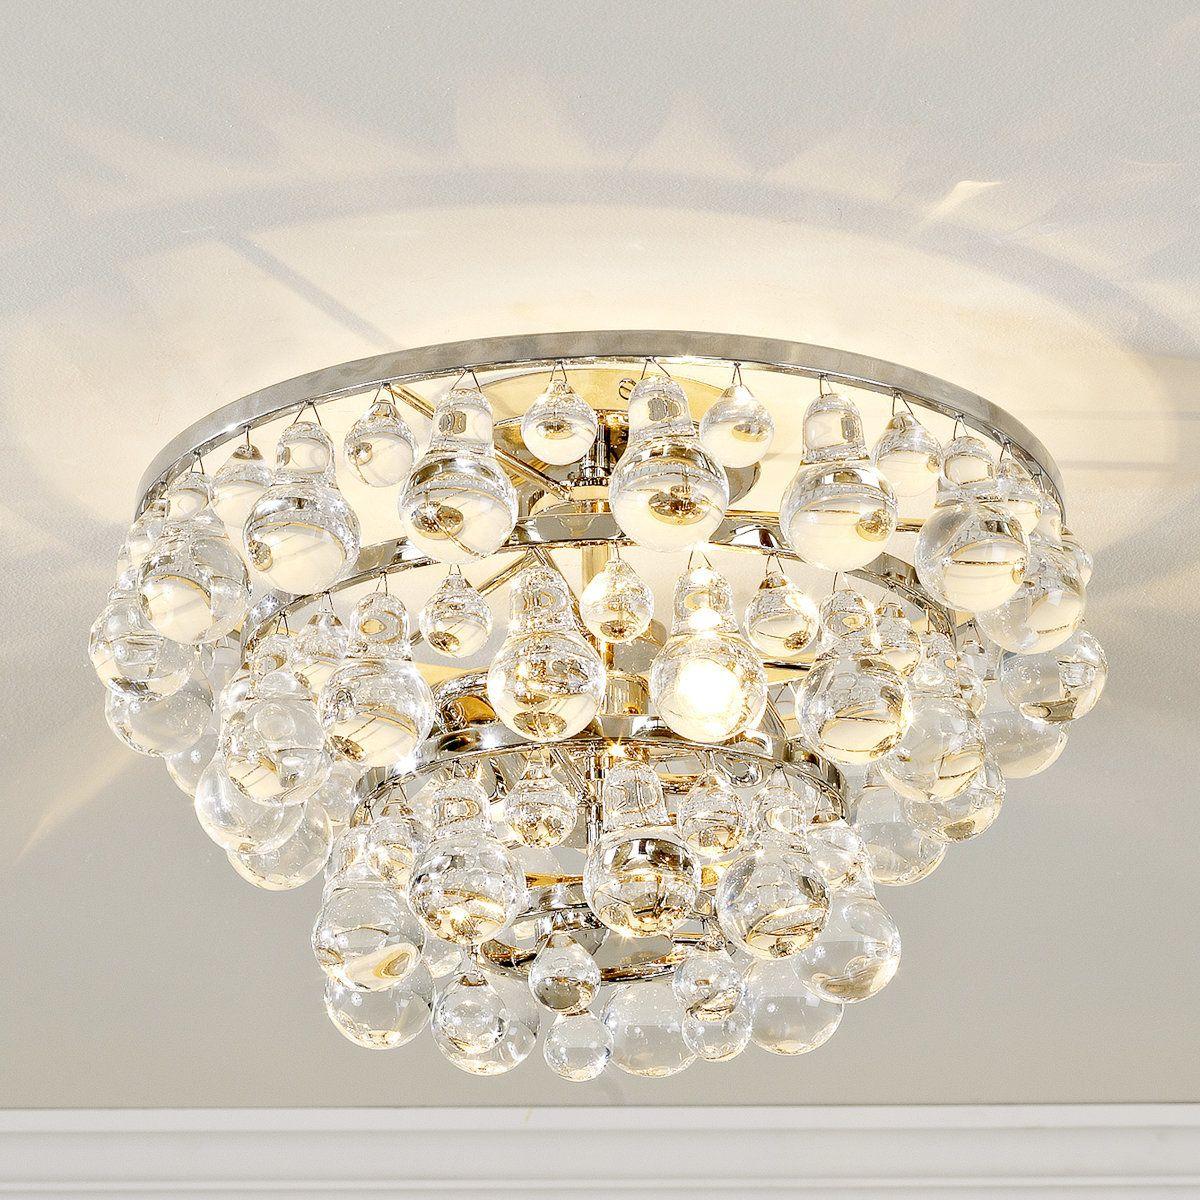 Deco Glam Ceiling Light In 2020 Ceiling Lights Ceiling Light